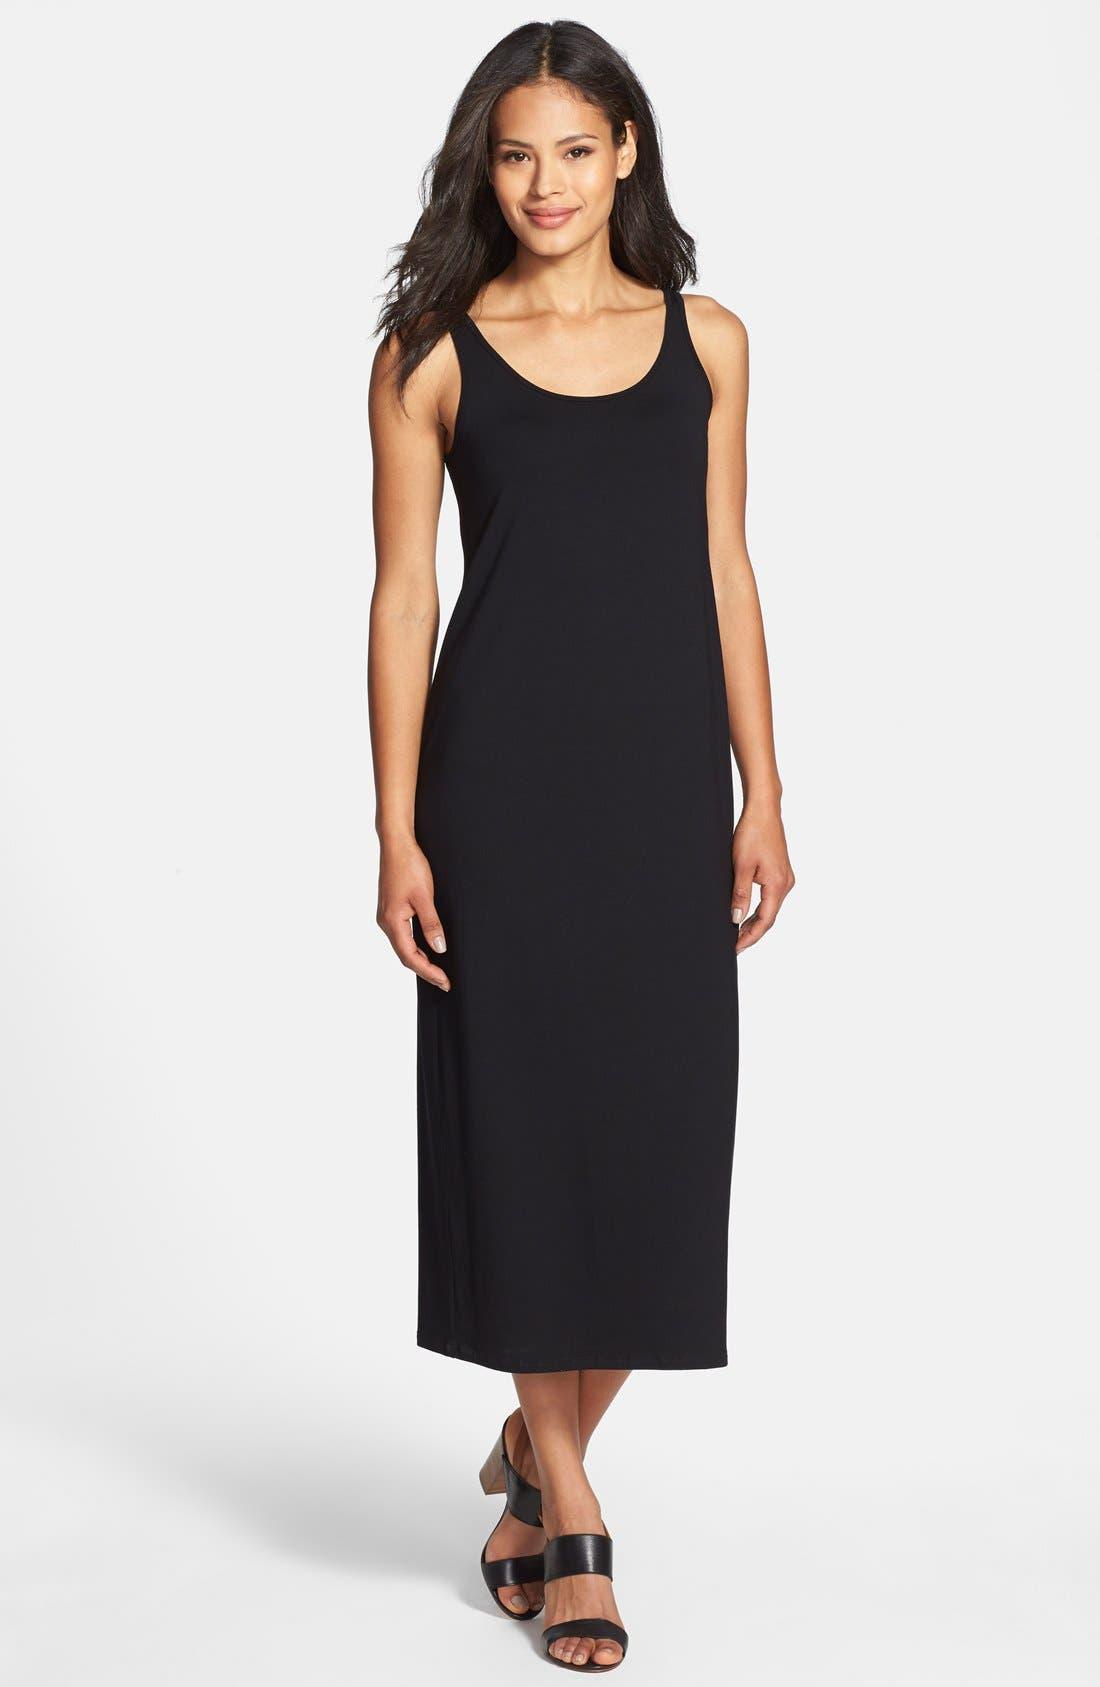 Alternate Image 1 Selected - Eileen Fisher Scoop Neck Jersey Dress (Regular & Petite)